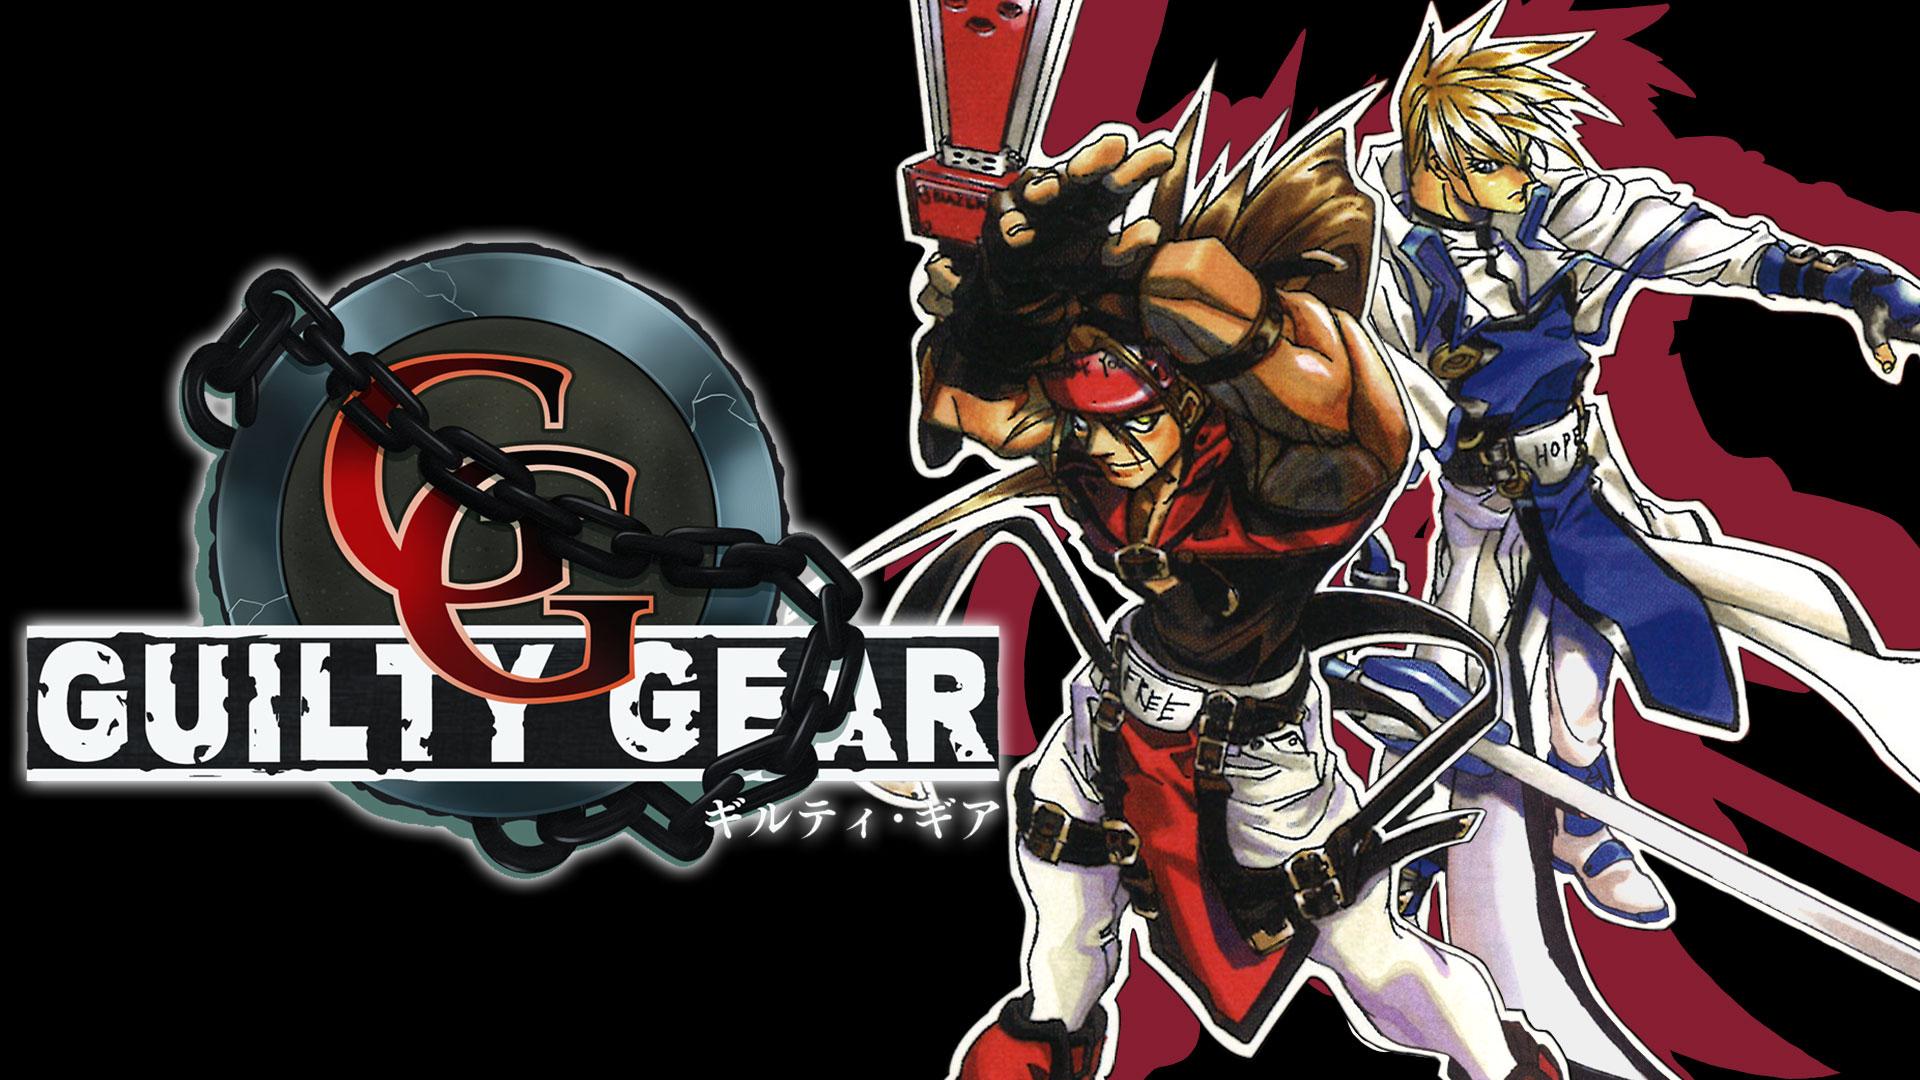 Guilty Gear XX Accent Core Plus R $4.20 or Guilty Gear (Nintendo Switch Digital Download) $4 via Nintendo eShop